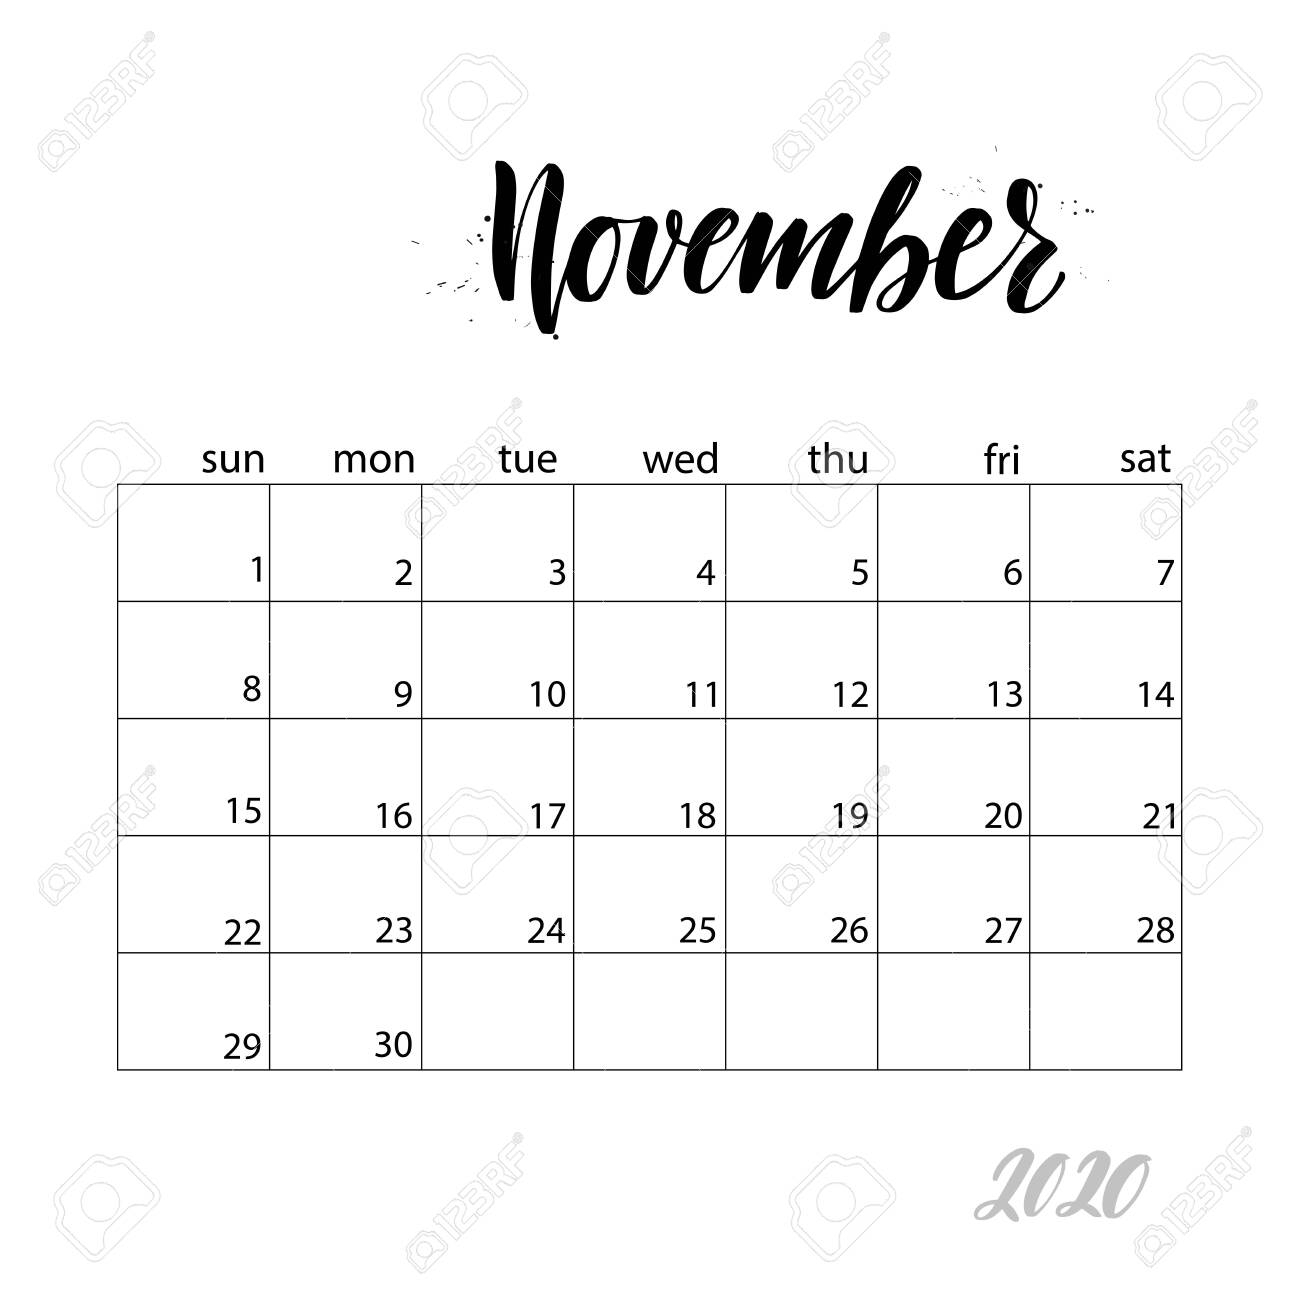 November. Monthly Calendar For 2020 Year. Handwritten Modern..